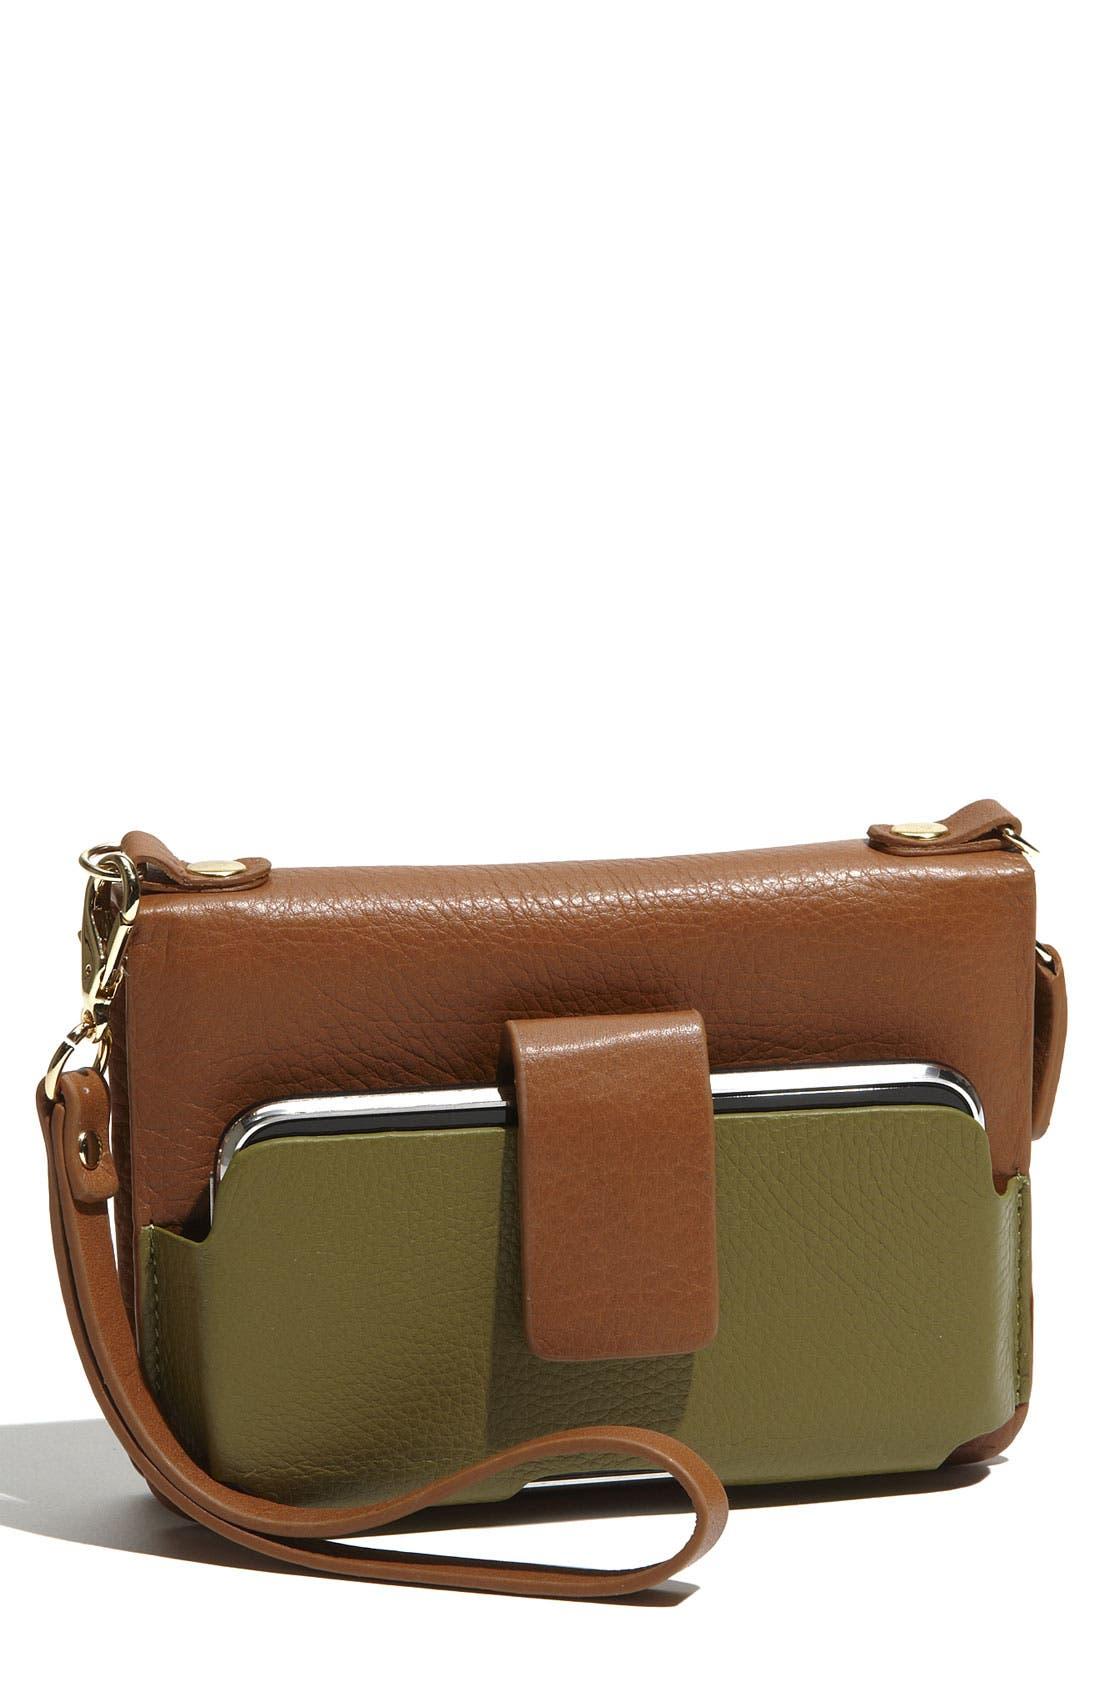 Alternate Image 1 Selected - Case-Mate® 'Kayla' Wristlet & Smartphone Case